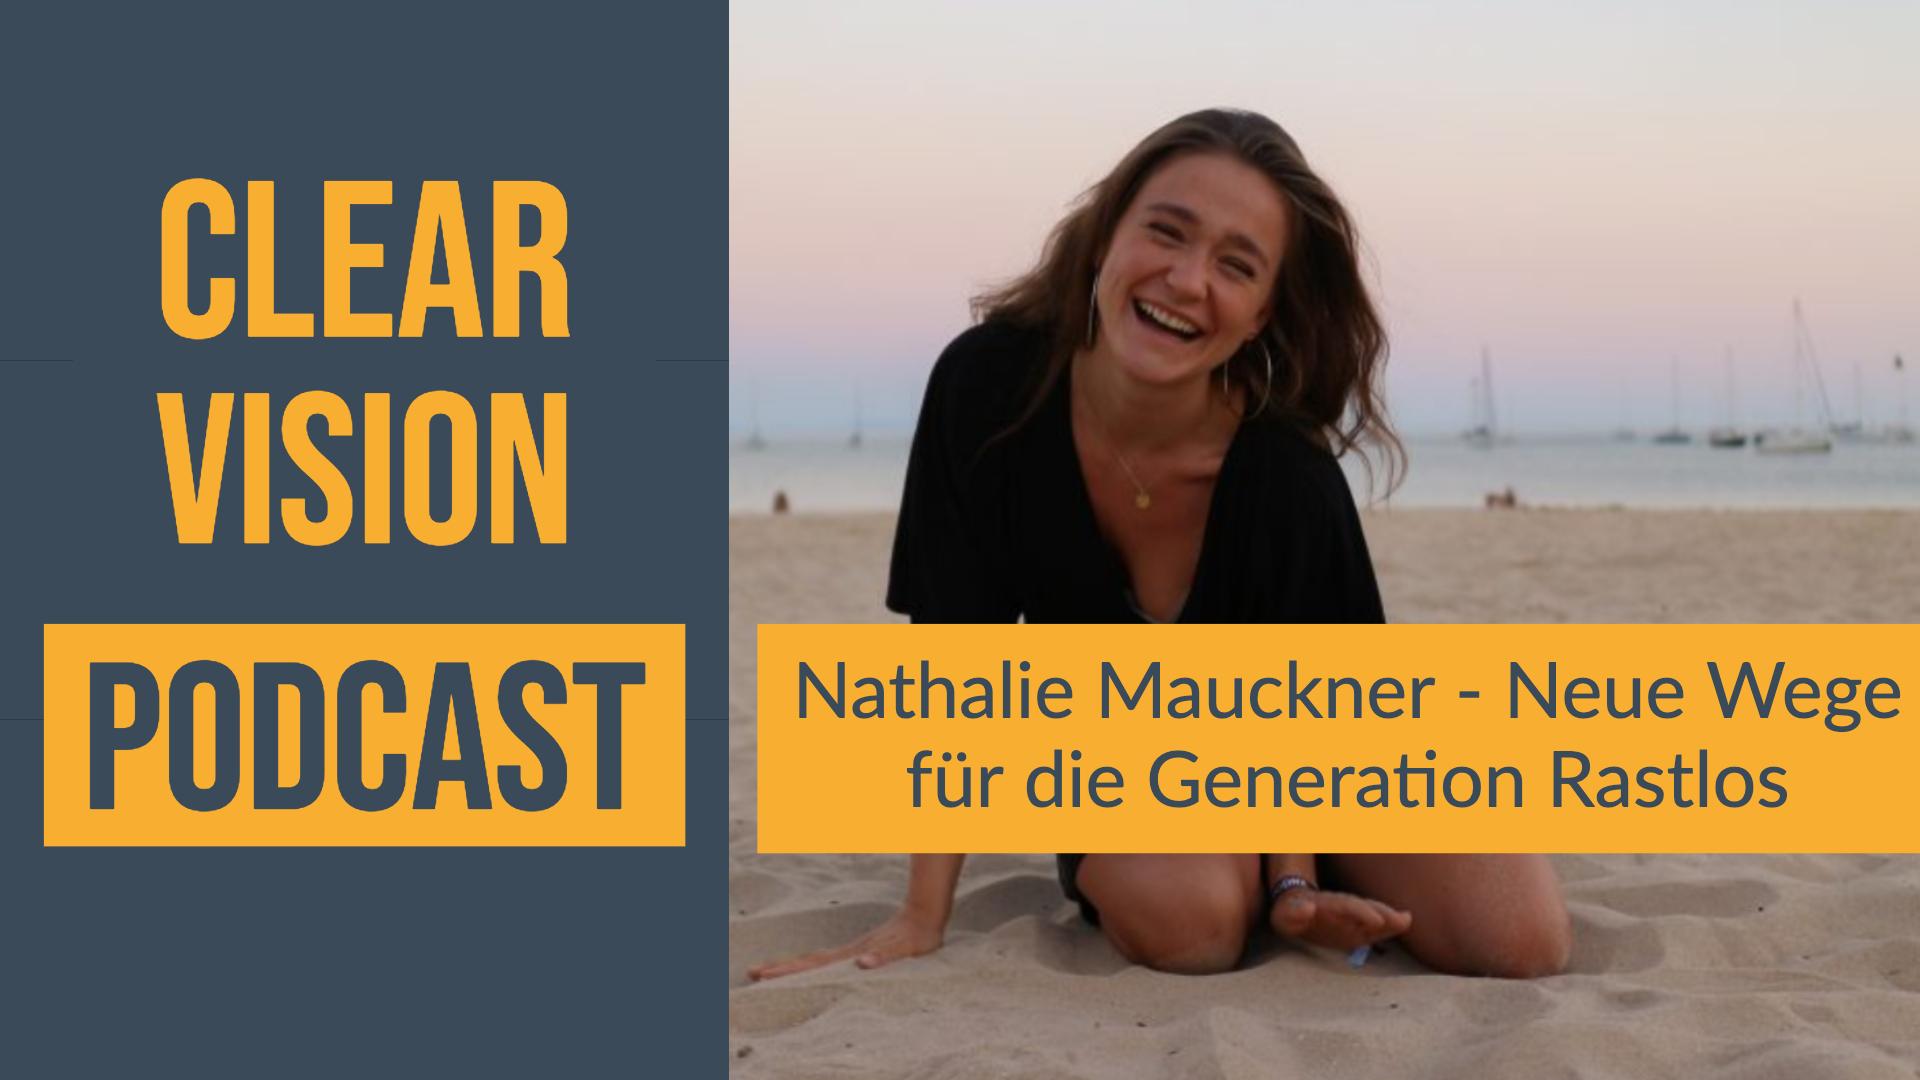 CV Nathalie Mauckner